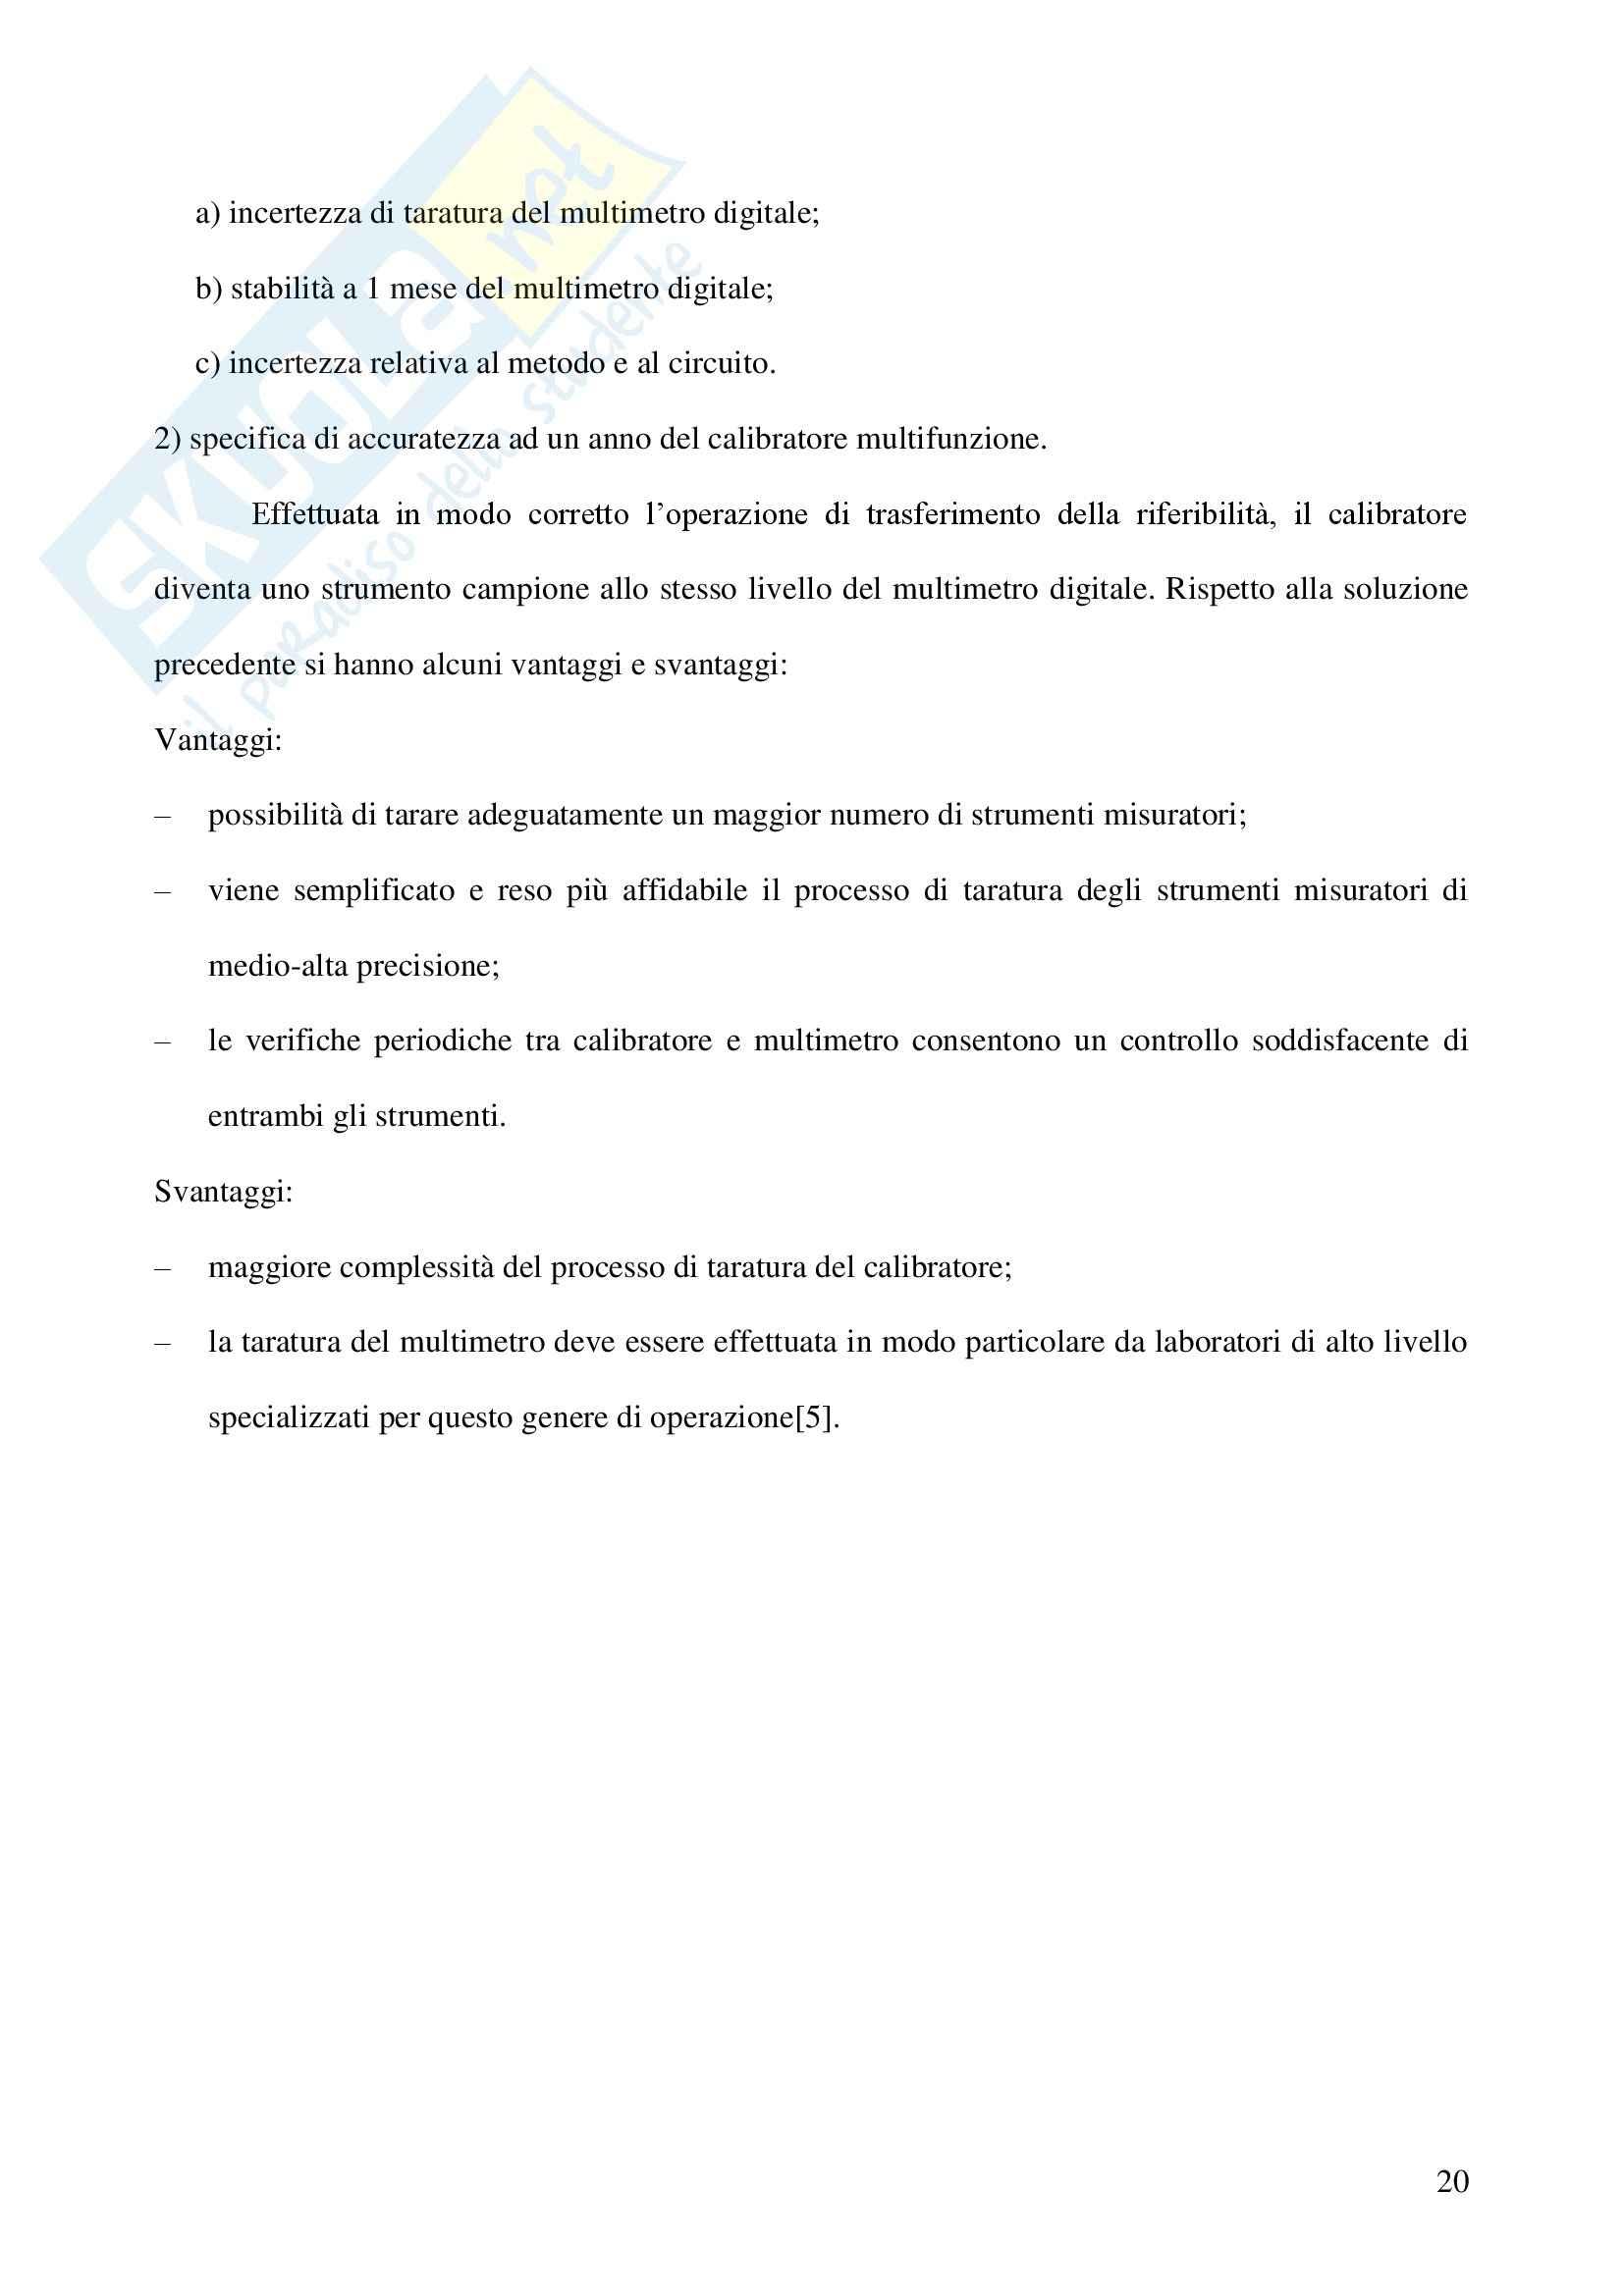 Tesi sperimentale Misure Elettroniche - Conferma metrologica Multimetro Pag. 21